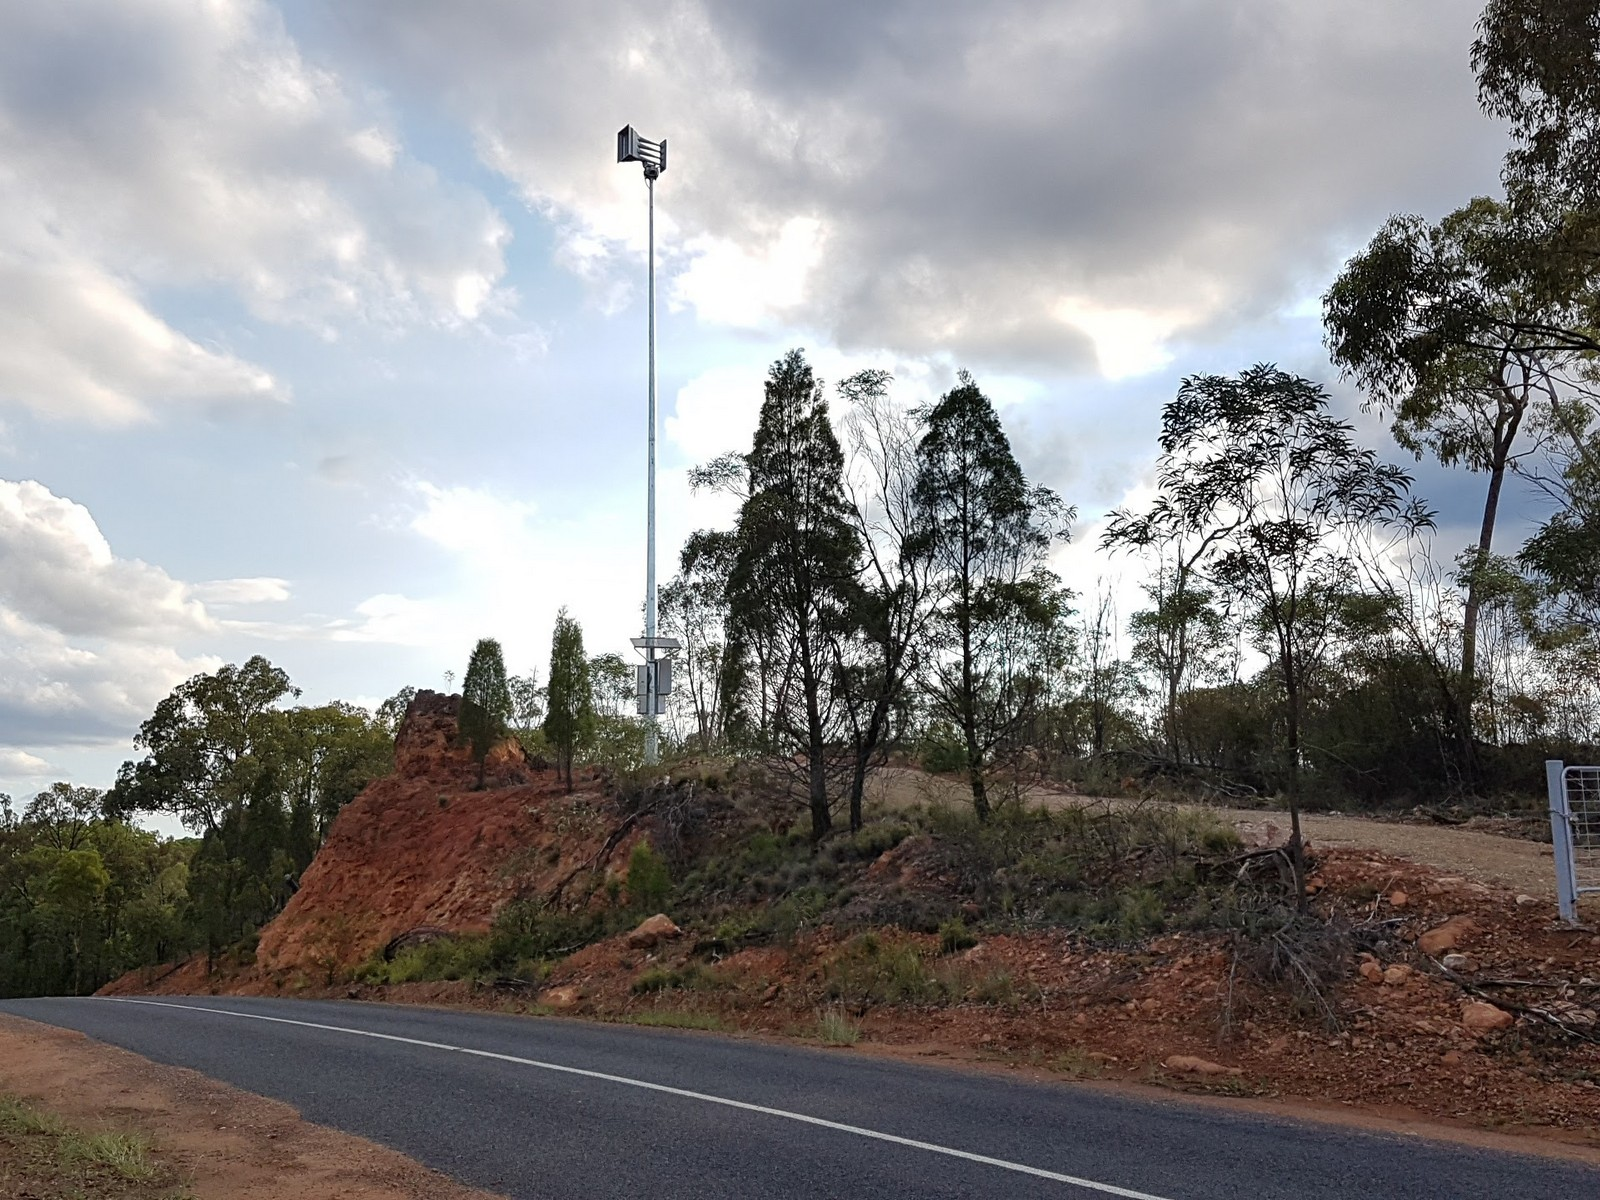 Millmerrin Bushfire Warning System - Toowoomba Regional Council